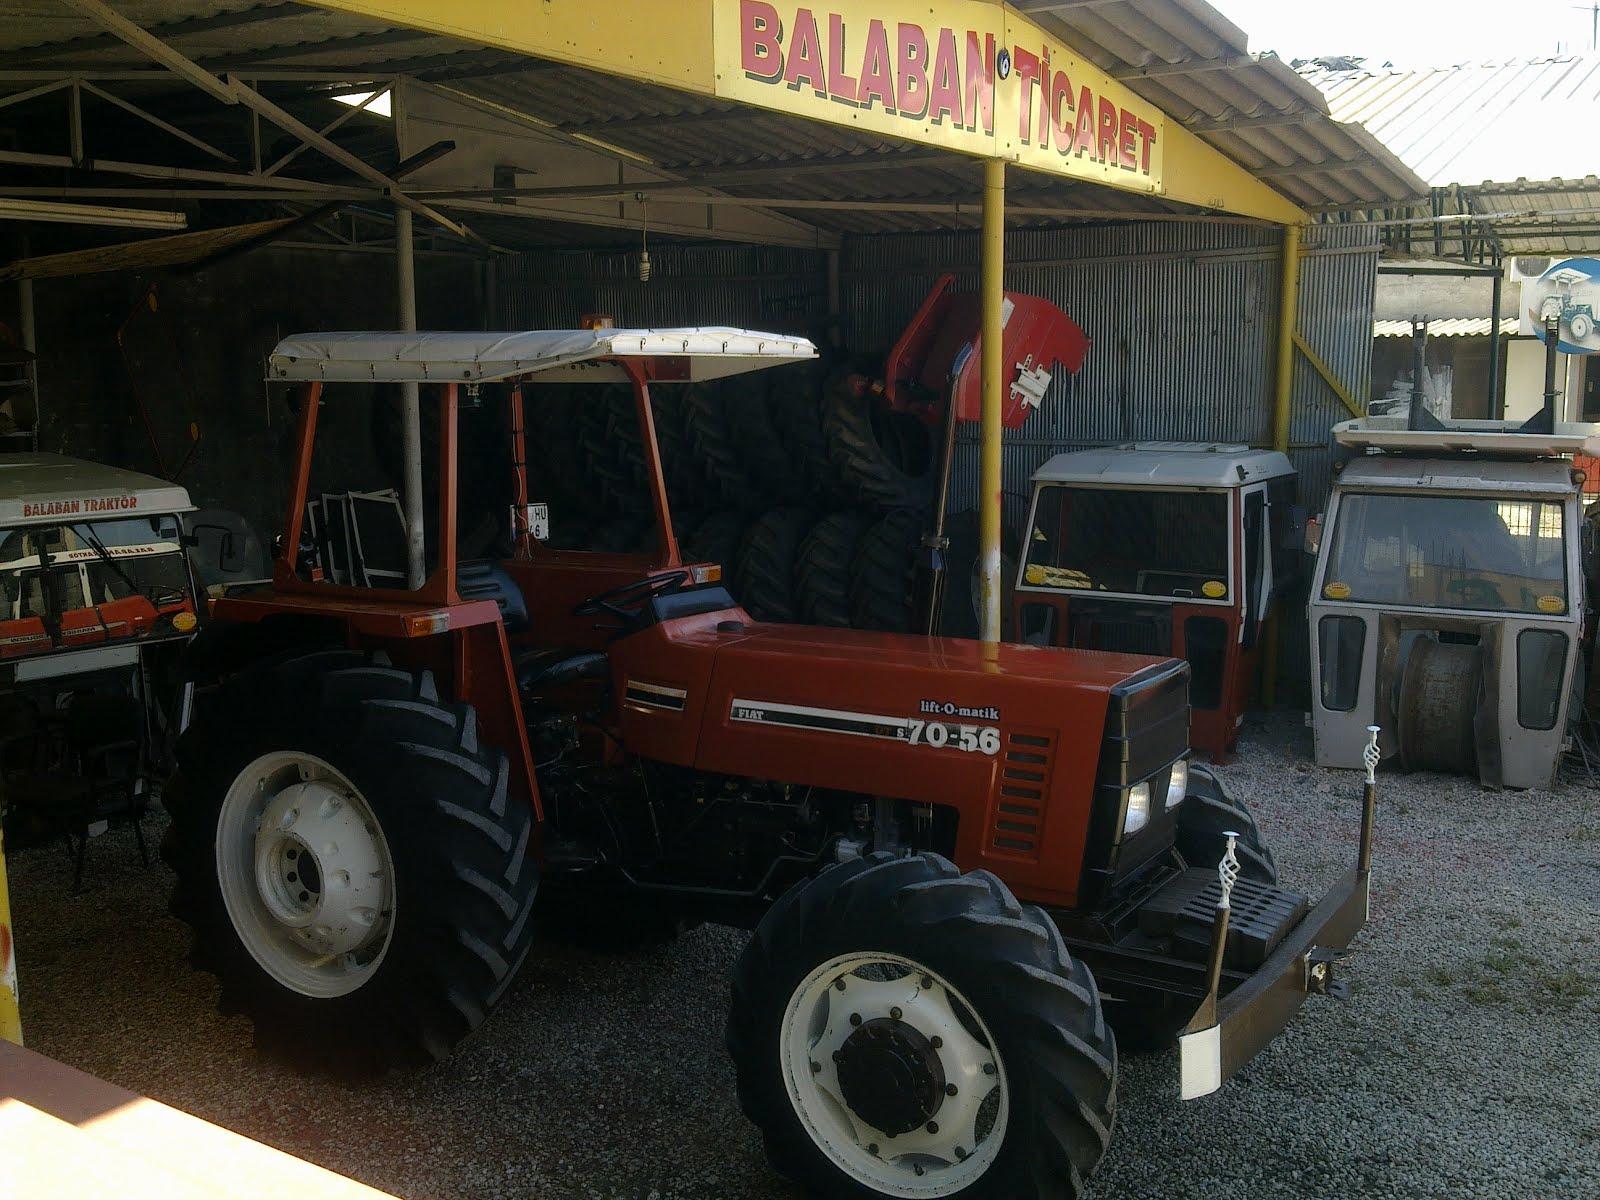 1997 model 70-56 s dt Çİft Çeker fİat traktÖr | balaban traktÖr